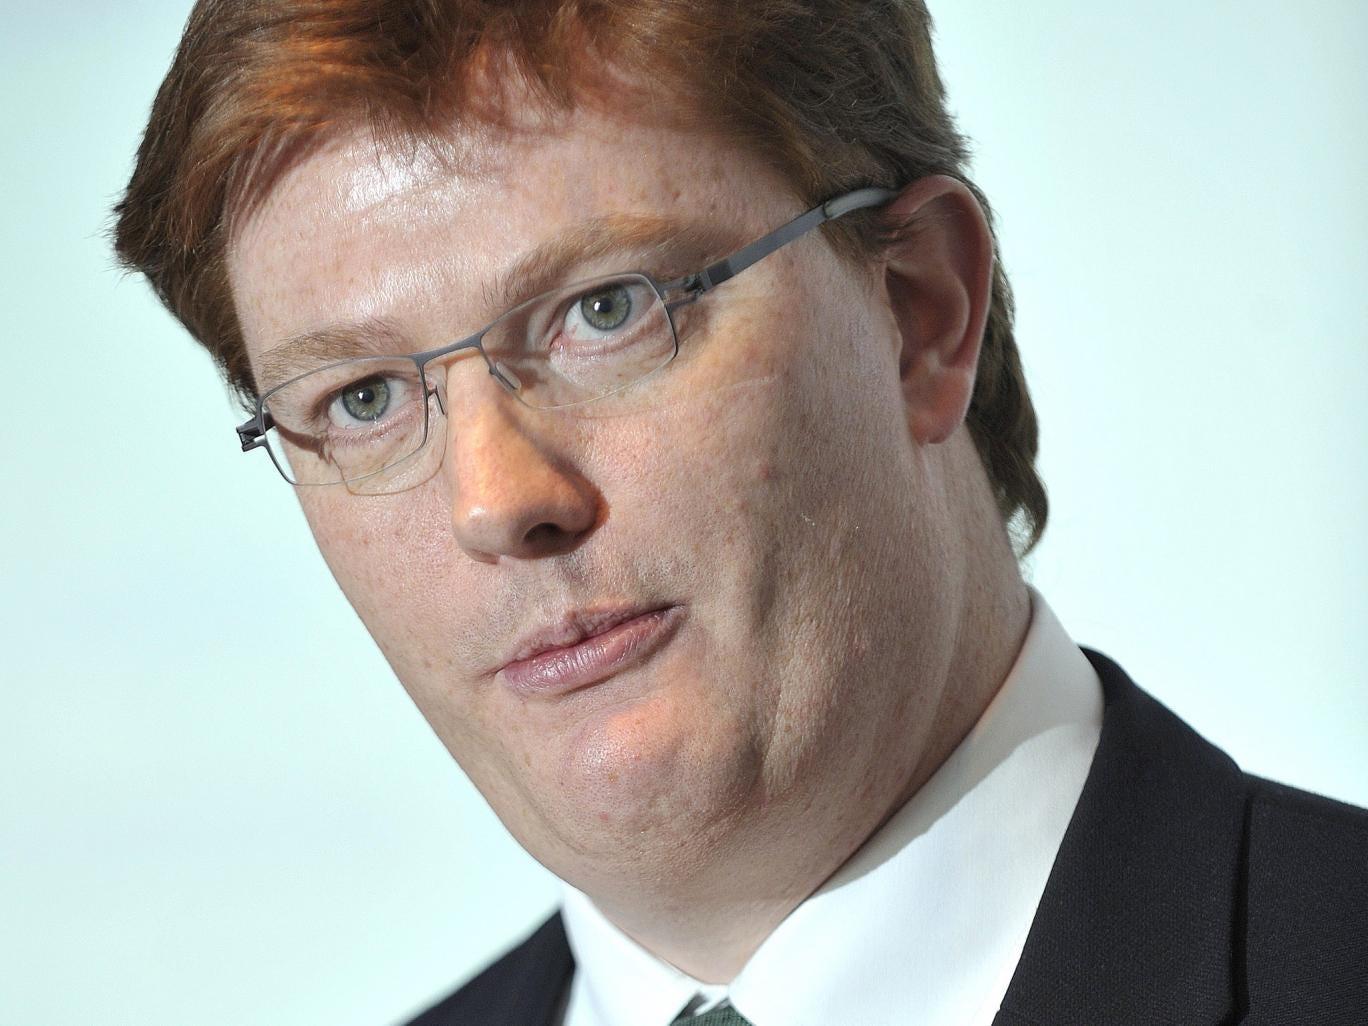 Chief Secretary to the Treasury, Danny Alexander